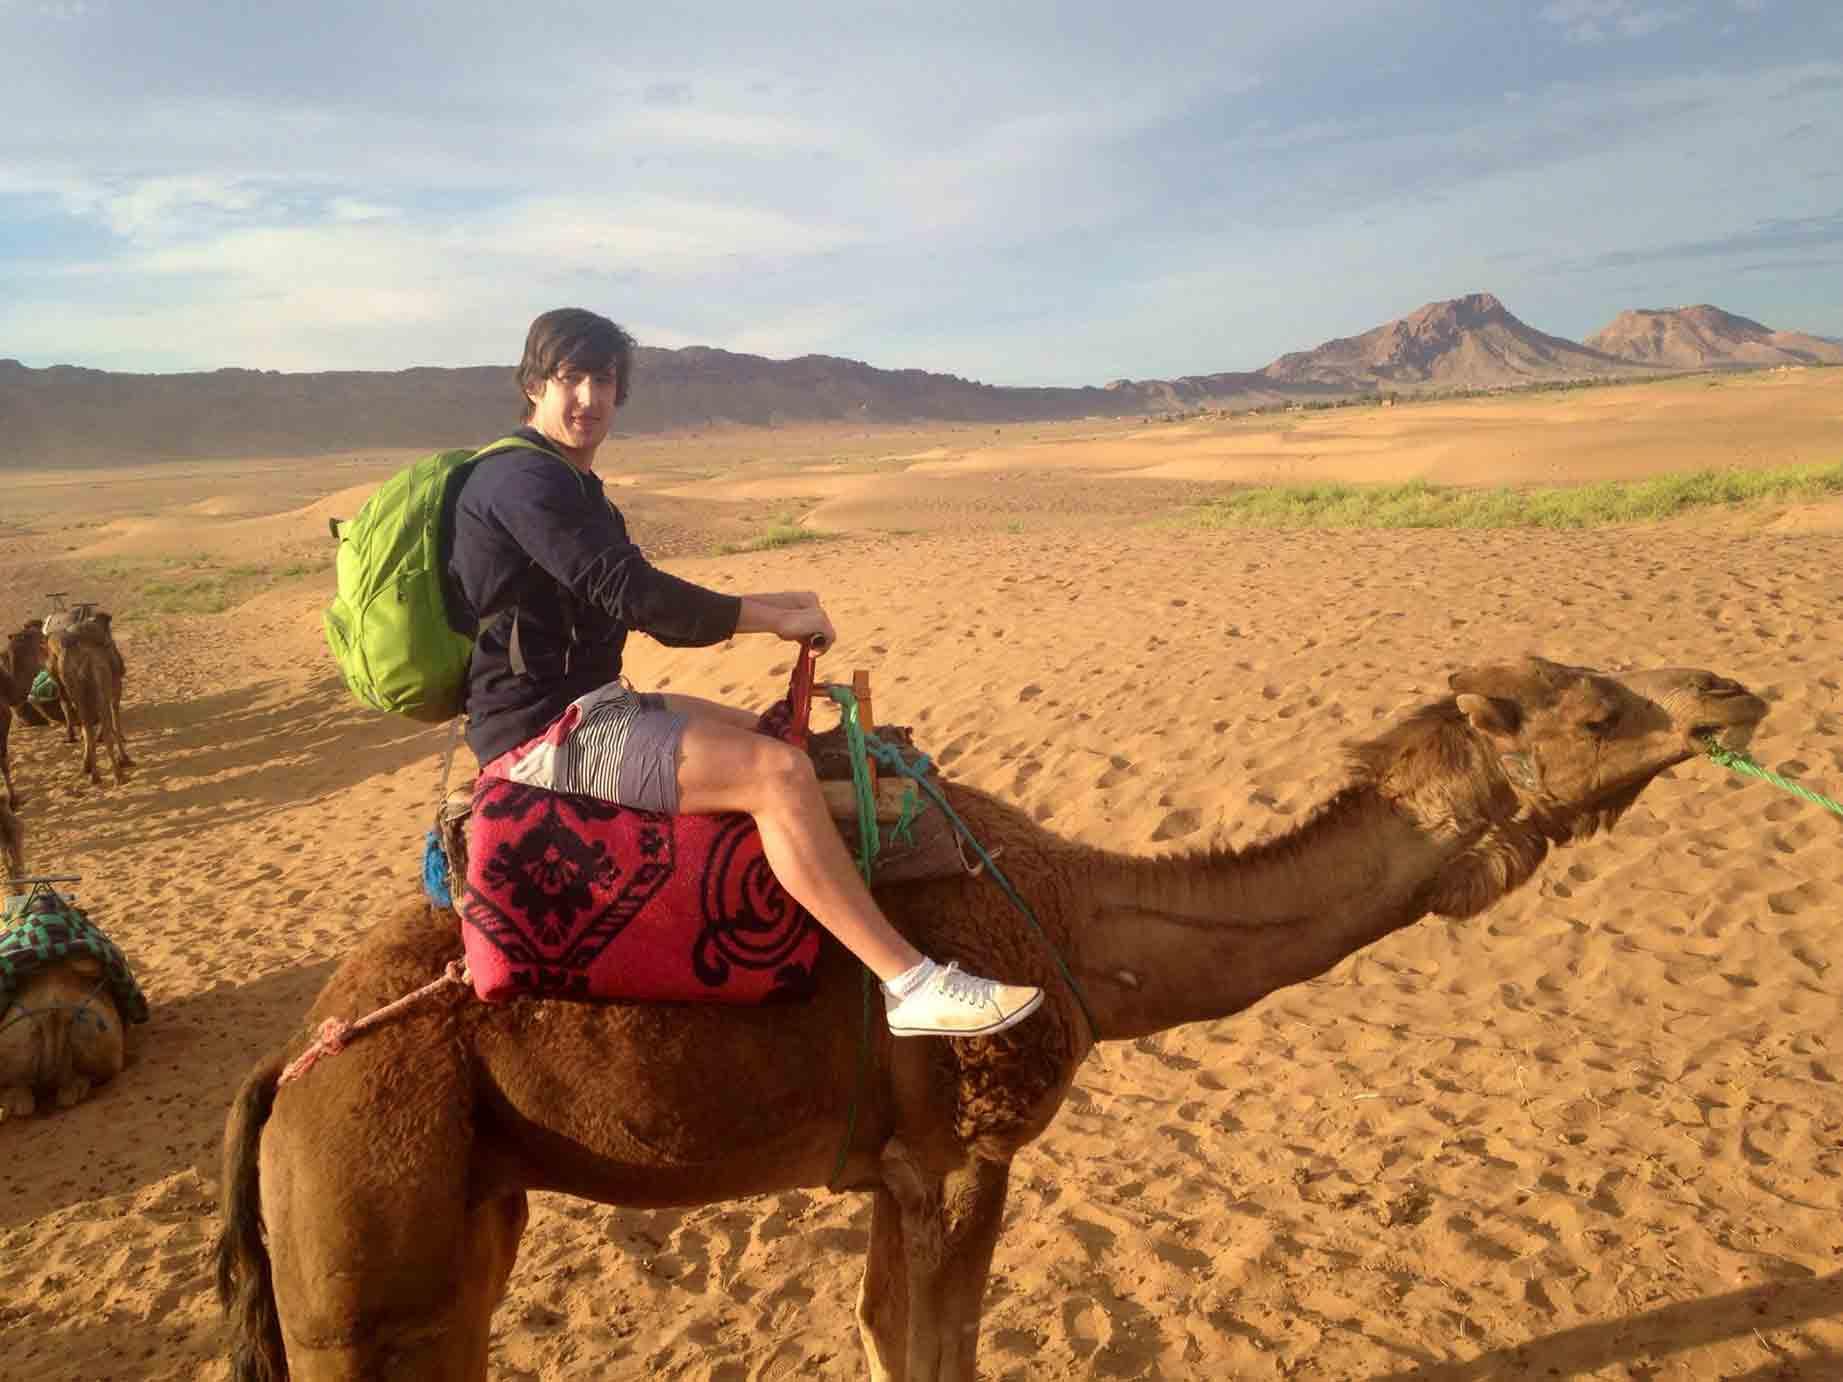 Matt on a camel